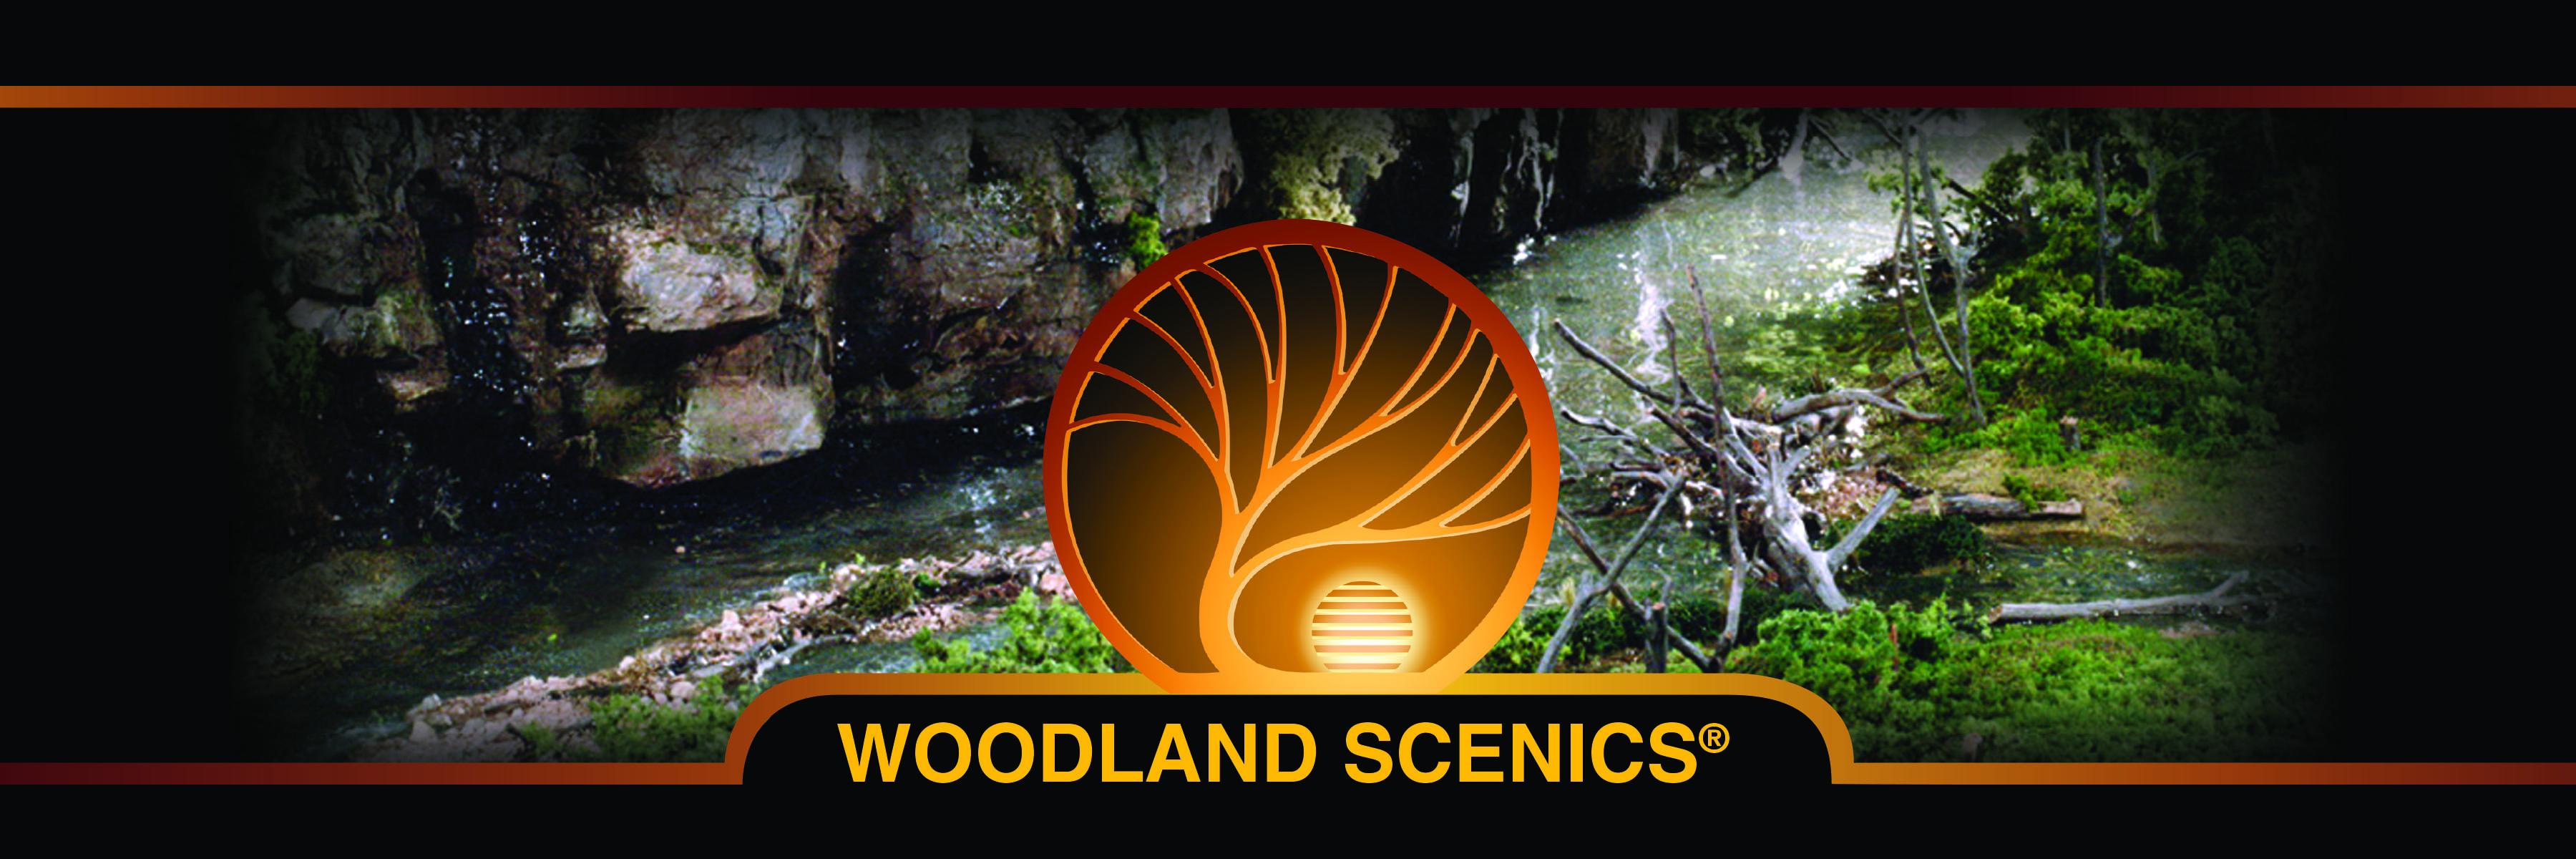 -b2b-resources-marketing-material-logos-woodland-scenics-company-logos-woodlandscenics-banner-12x4-1-.jpg